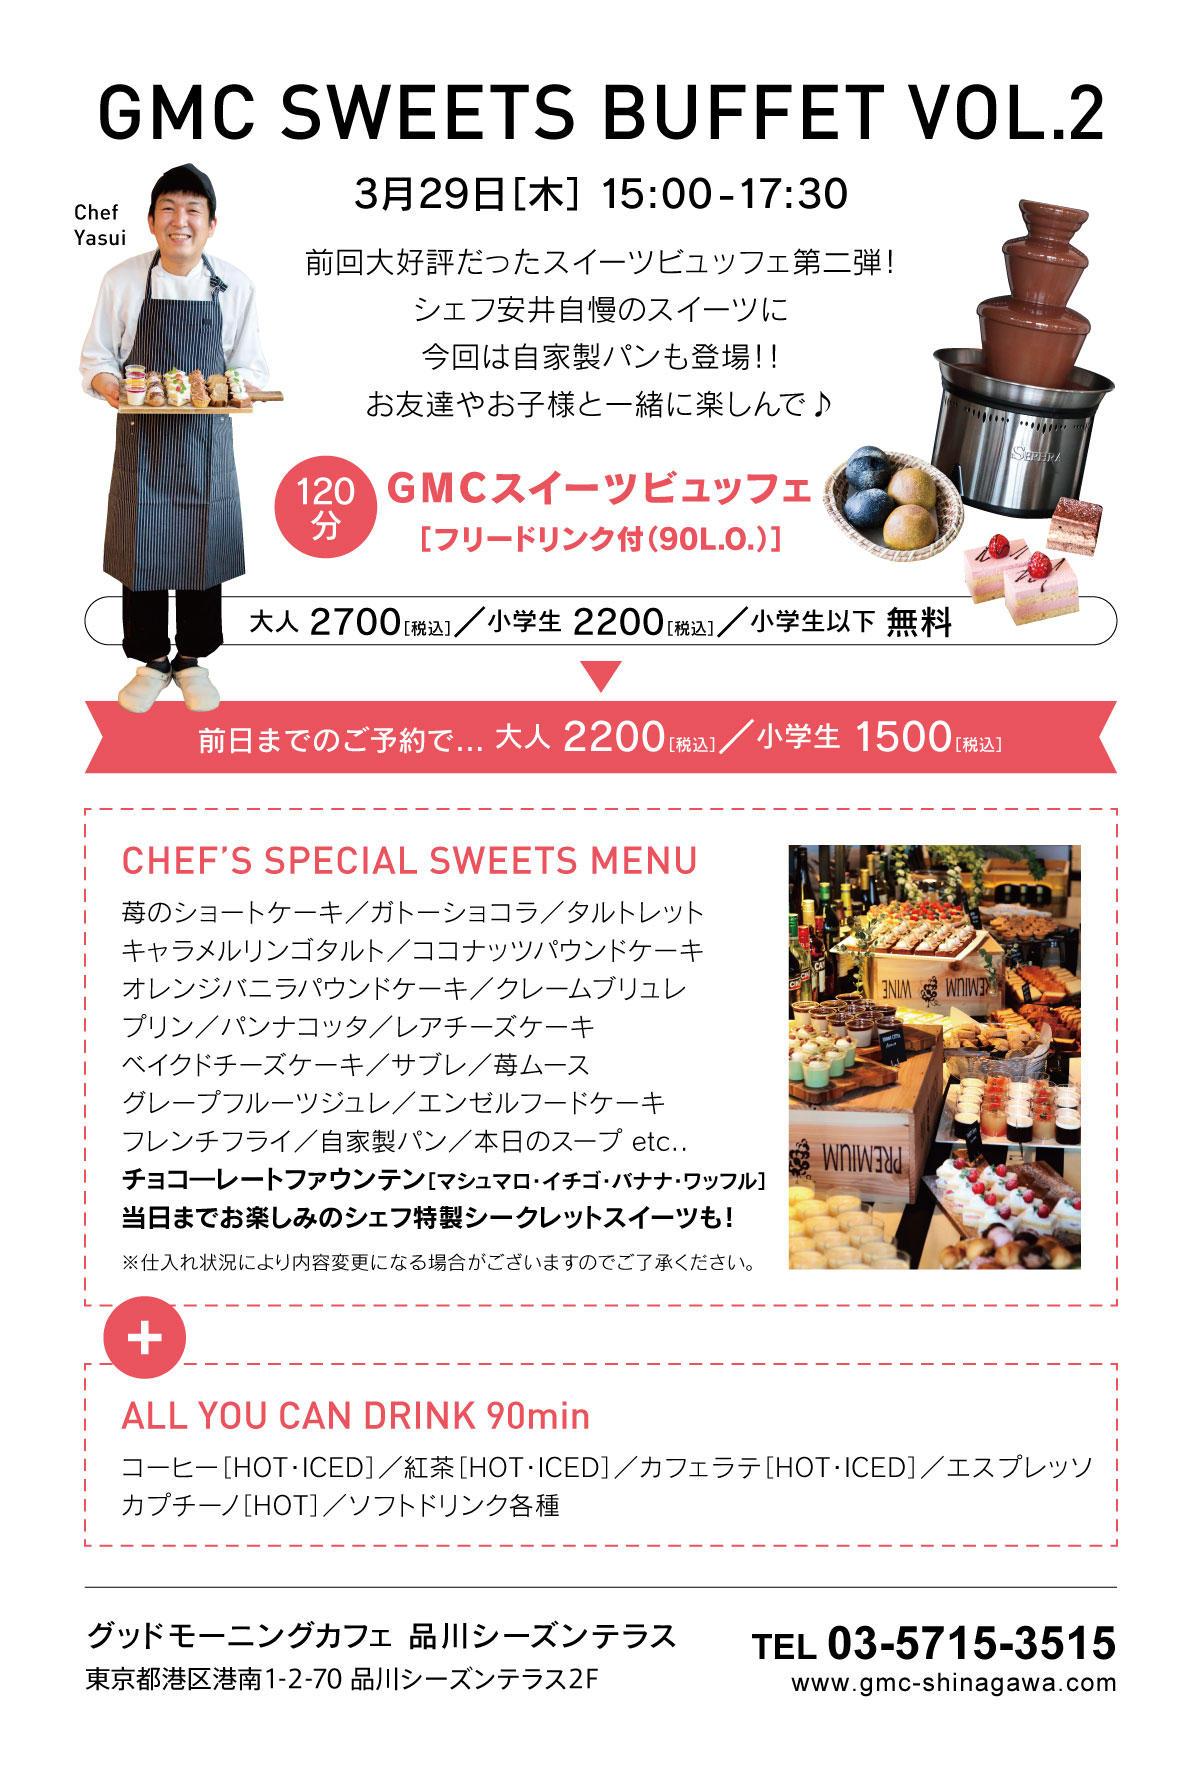 gmcsi_180305_sweetsbuffet_main.jpg